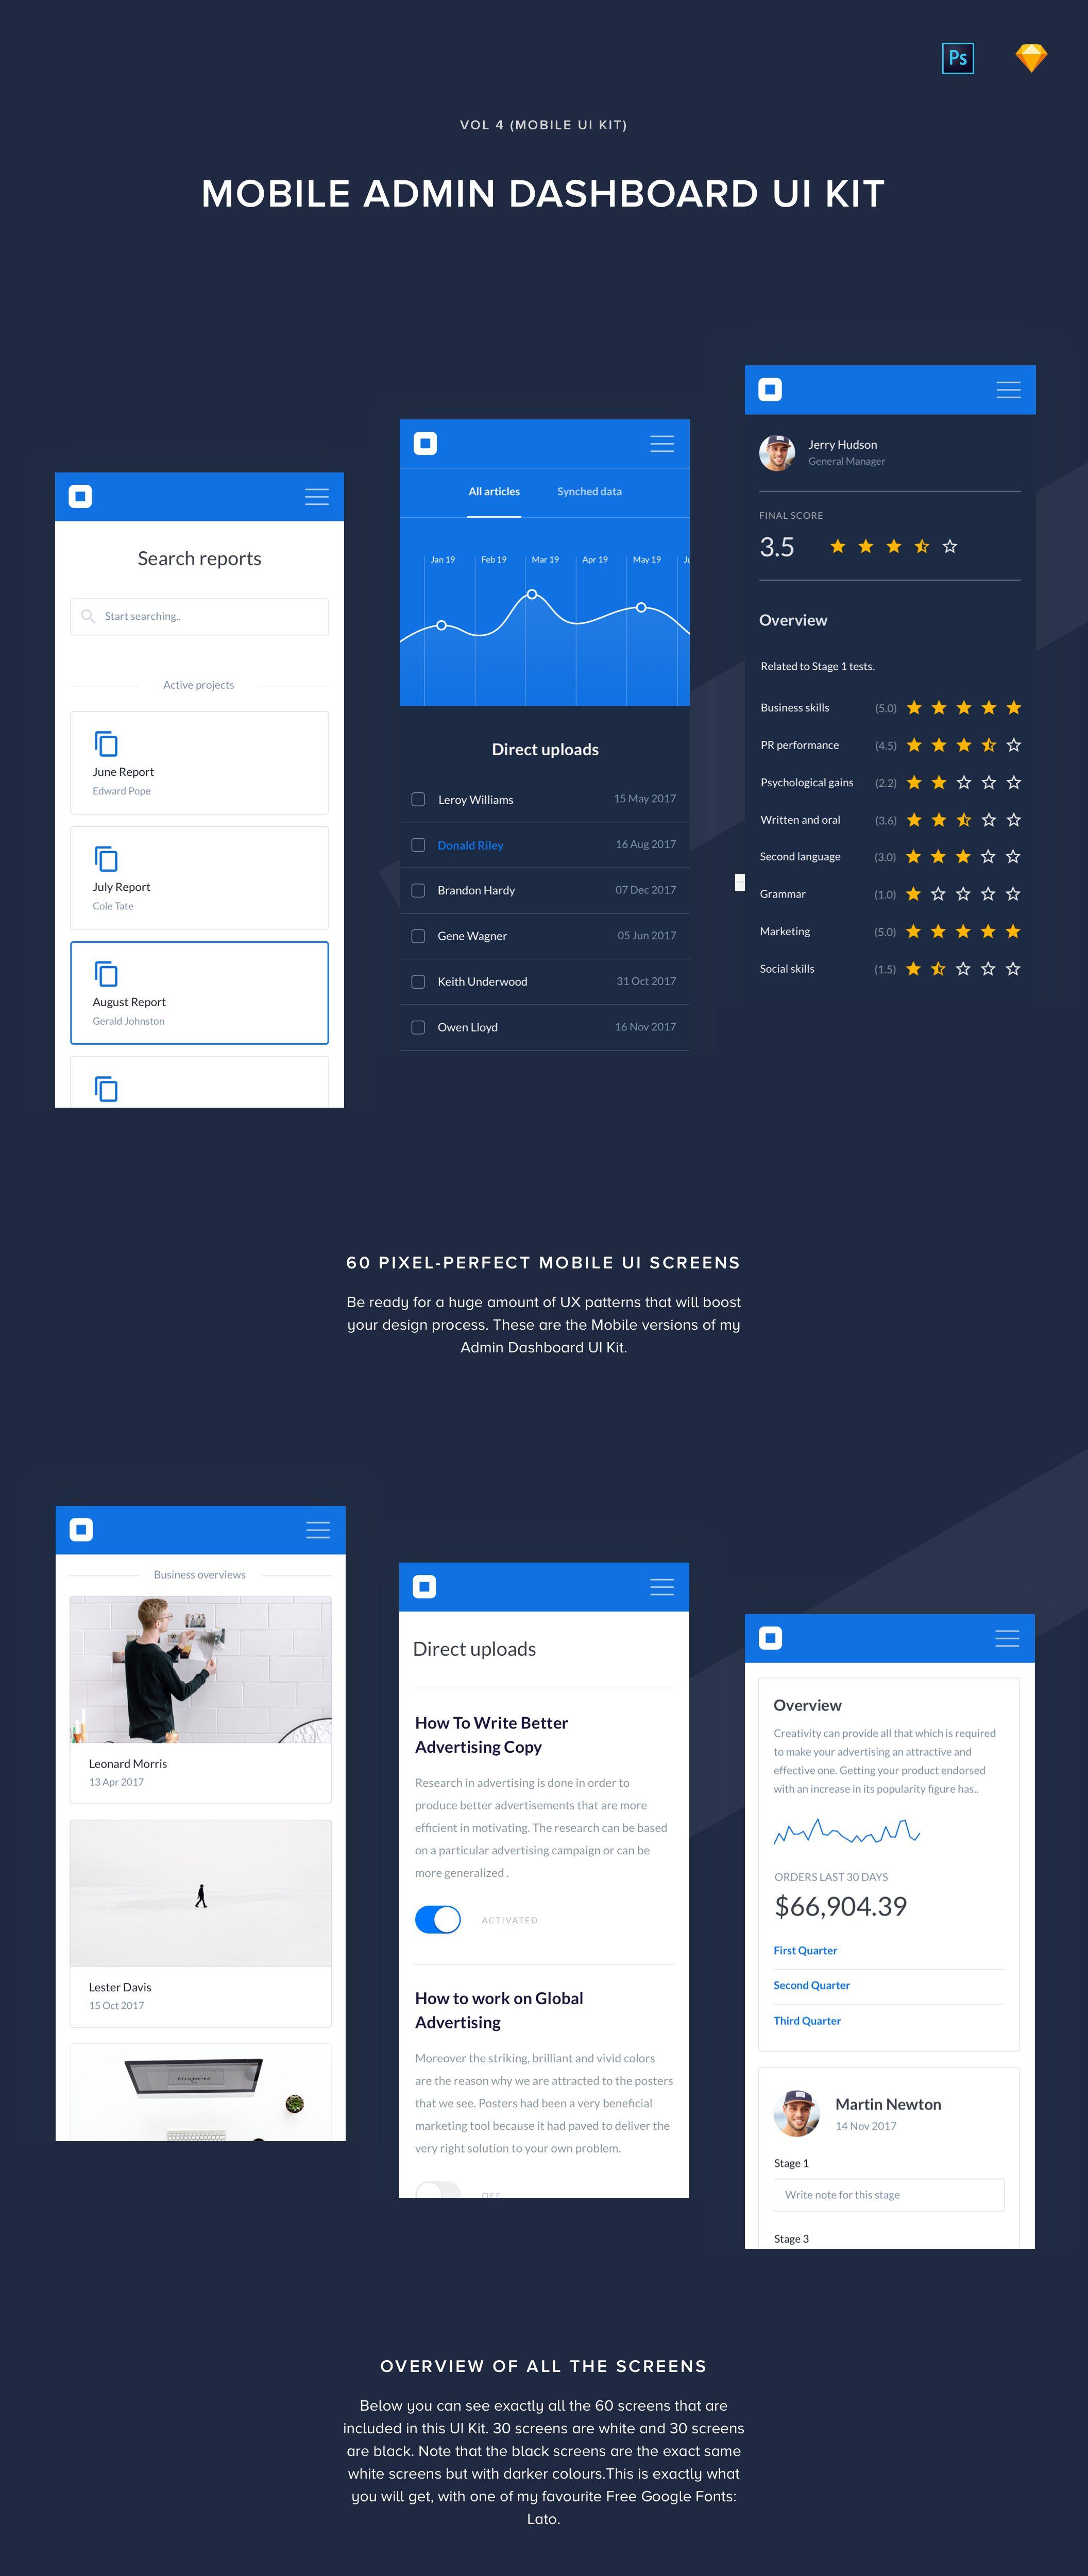 The Mobile Admin Dashboard UI Kit — UI Kits on UI8 | MB identity